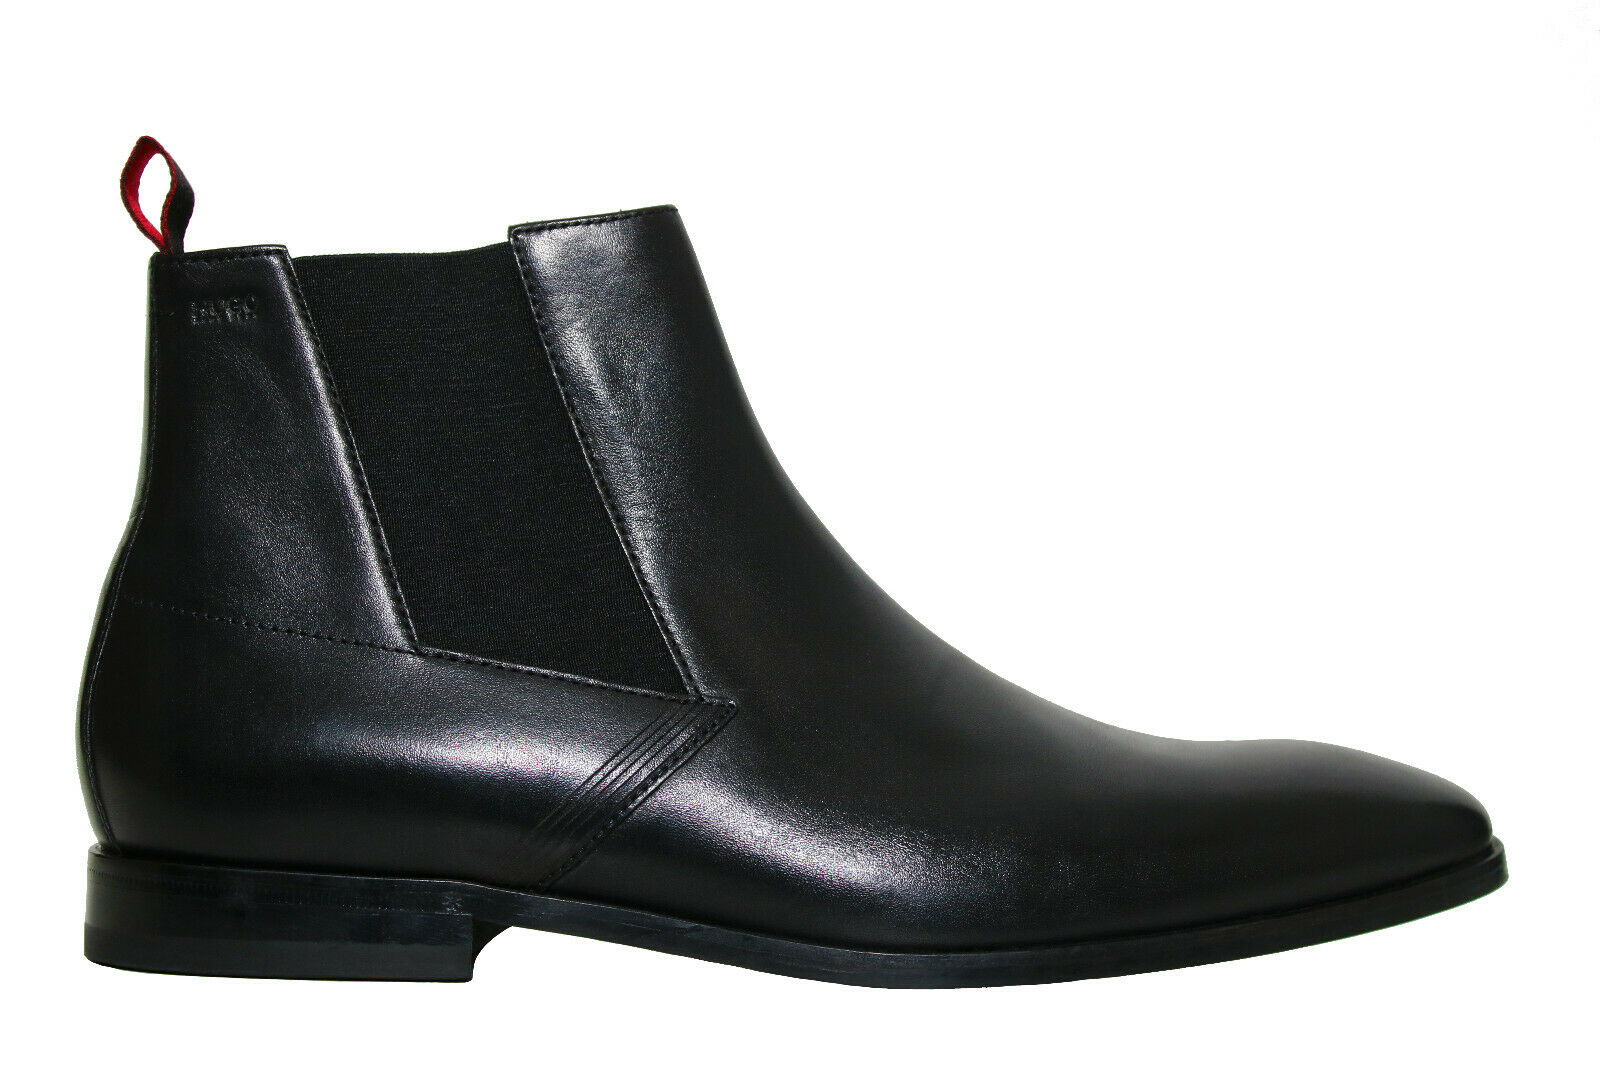 HUGO by HUGO BOSS Schuhe Stiefel Stiefel Square_Cheb_Itls Gr. 44 44 44 UK 10 US 11 NEU db0001